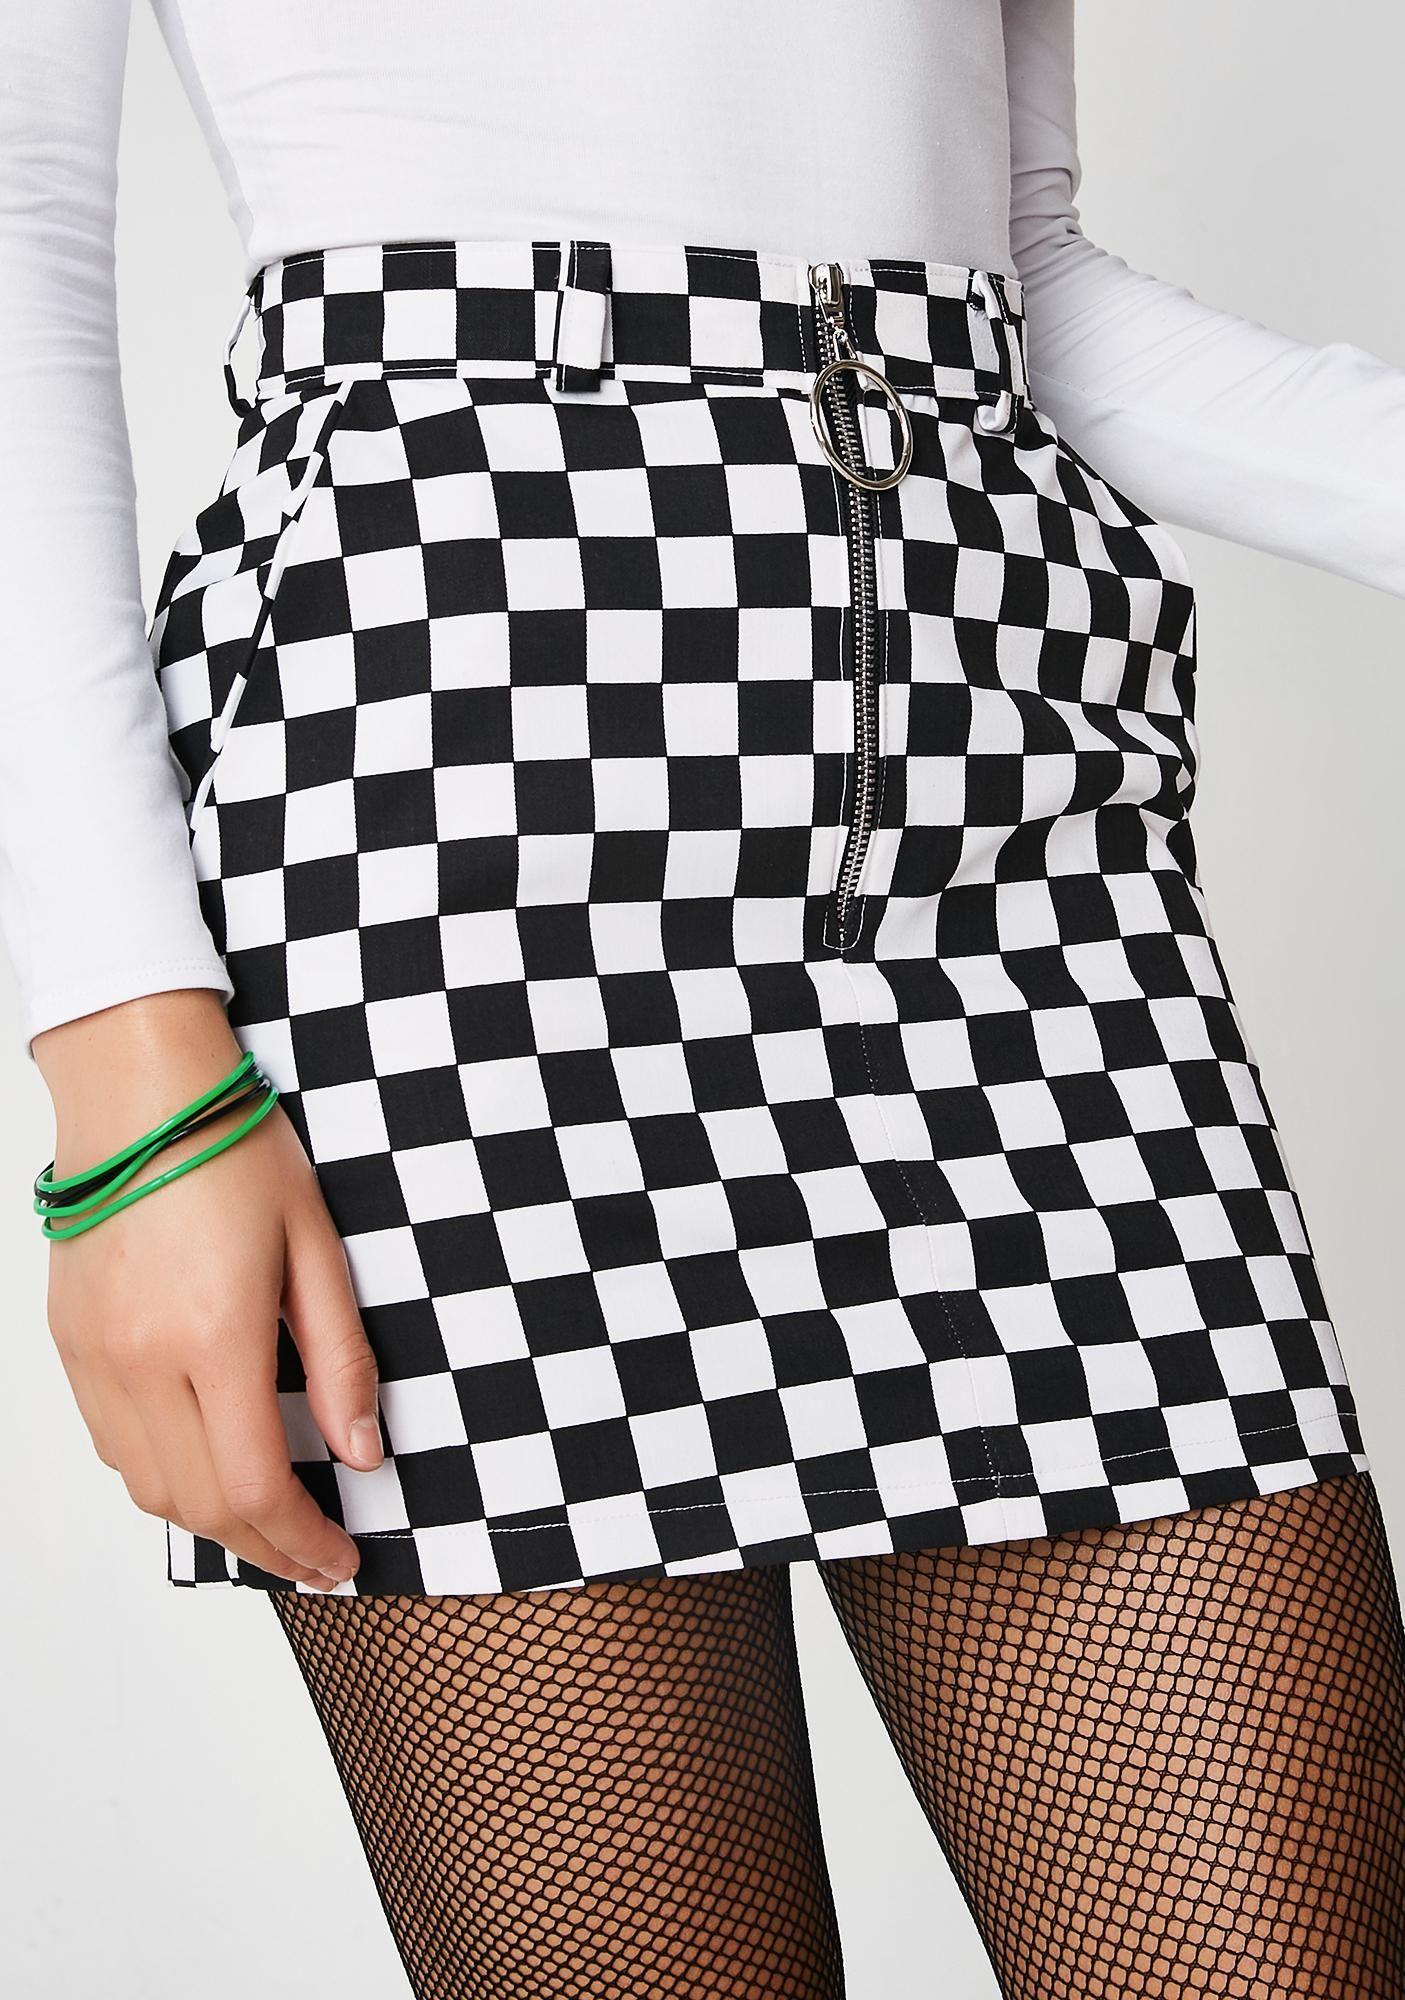 f9b3e78312 LOVE TOO TRUE Checkered Mini Skirt got 'em lookin' at ya. This dope af mini  skirt has a black N' white checkered print, a front zipper closure, ...